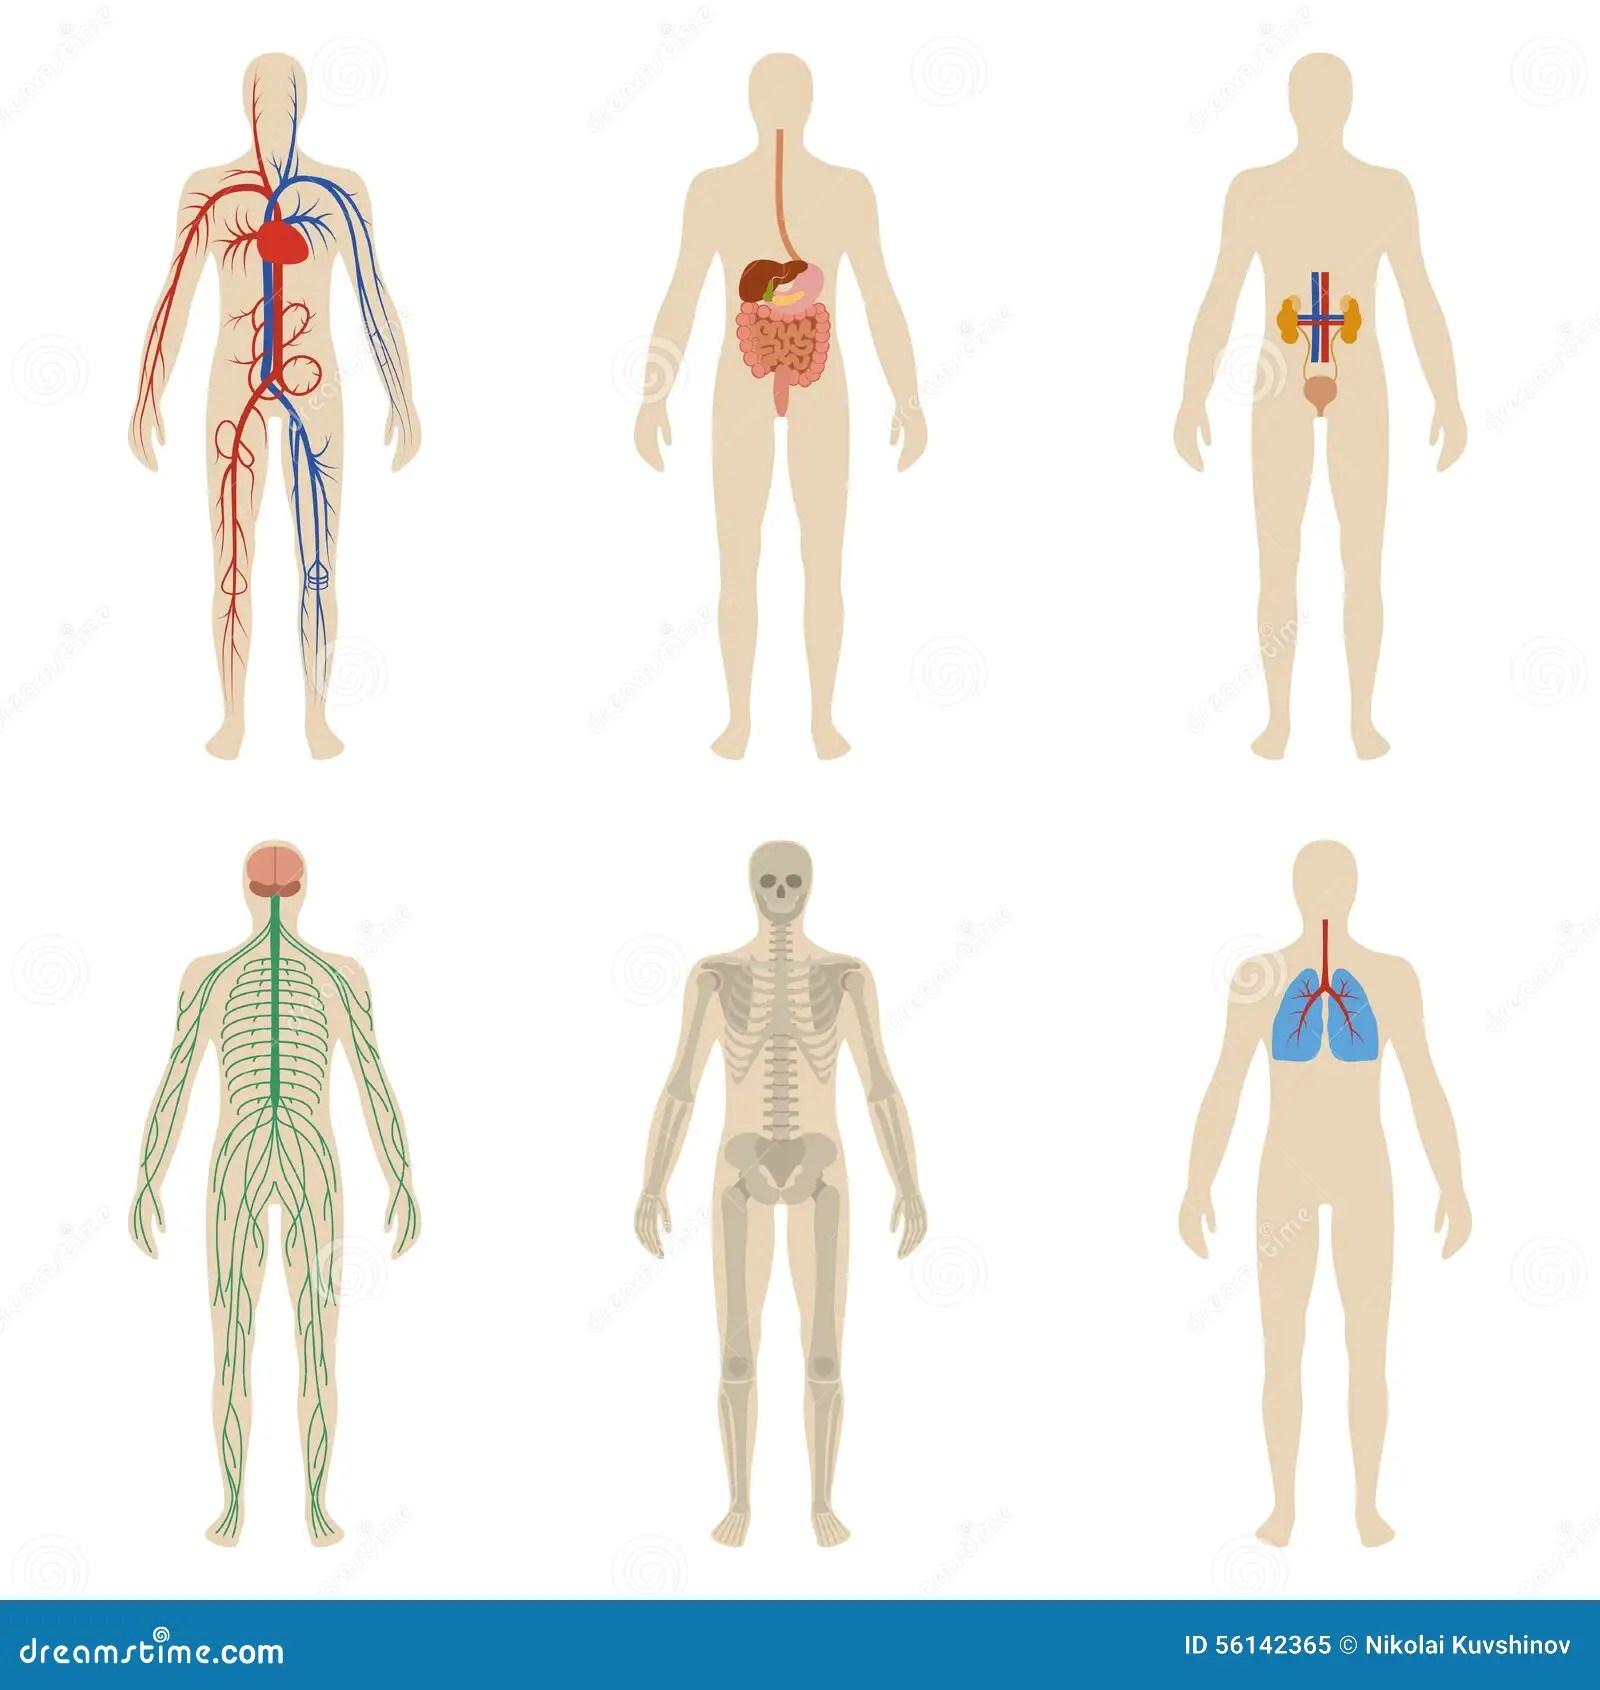 Organes Humains Et Systemes Regles De La Vitalite De Corps